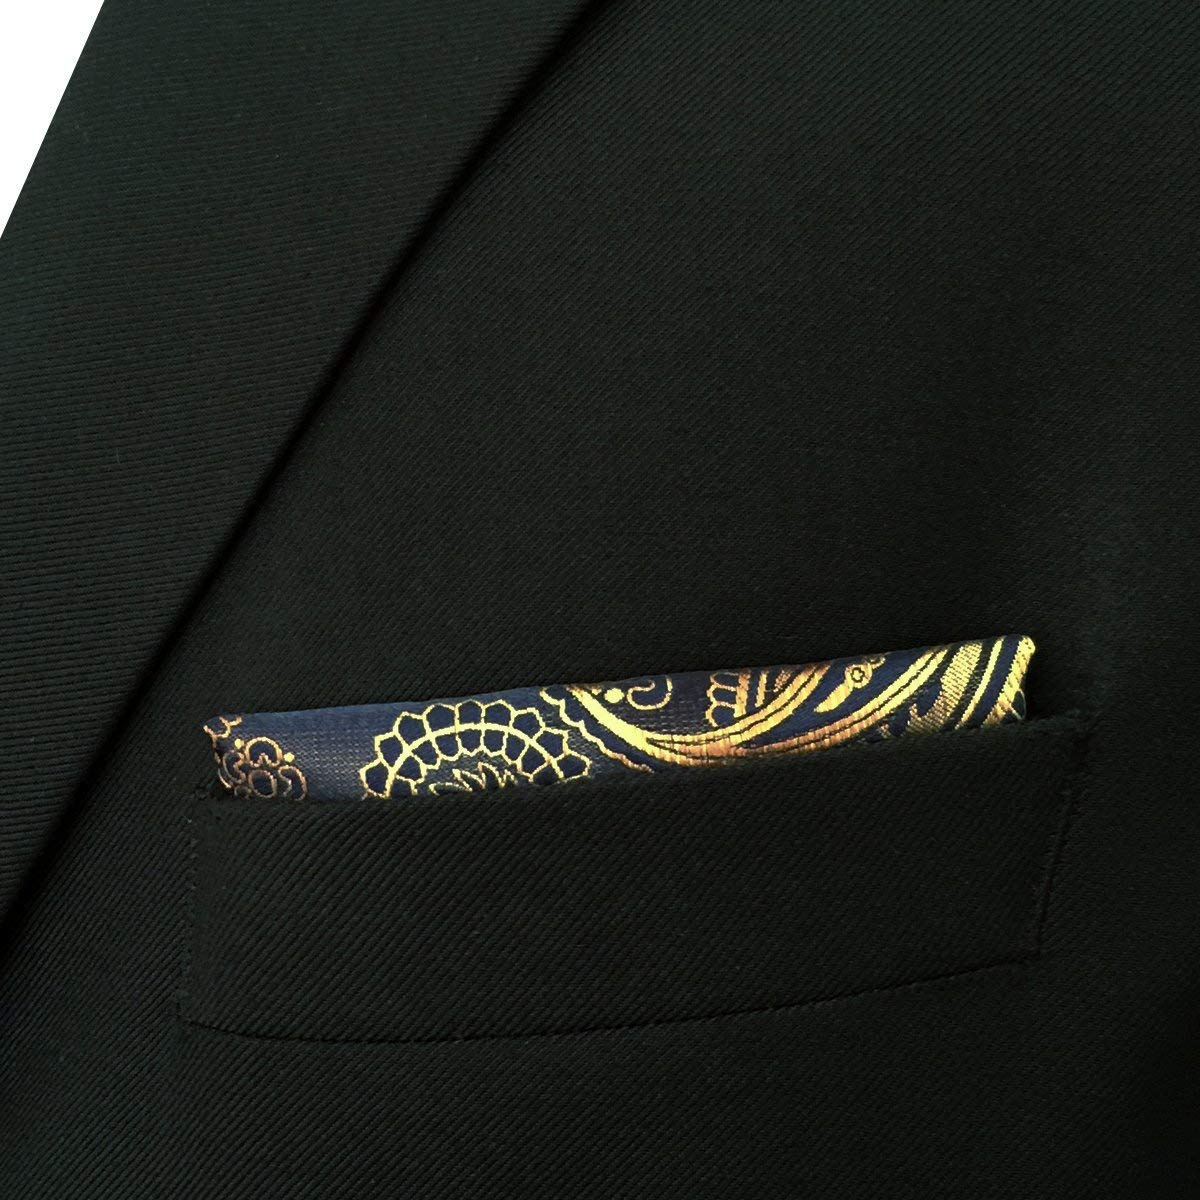 335ac04baac1 Shlax/& Wing Paisley Black Gold Pocket Square Mens Ties Silk Hankies  Handkerchief Shlax /